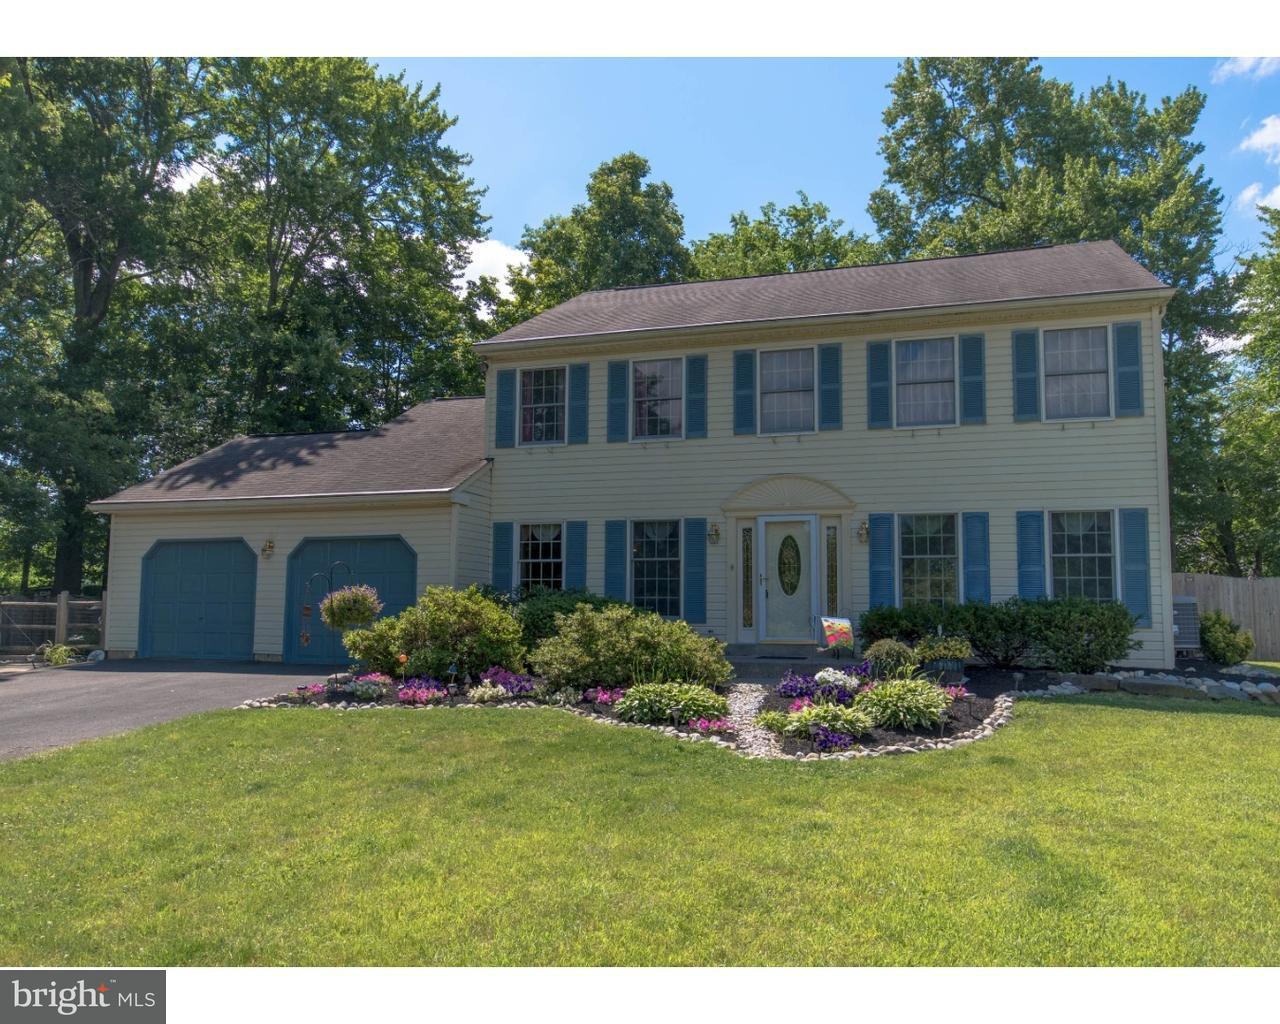 Enfamiljshus för Försäljning vid 1543 BITTERSWEET Circle Jamison, Pennsylvania 18929 Usa